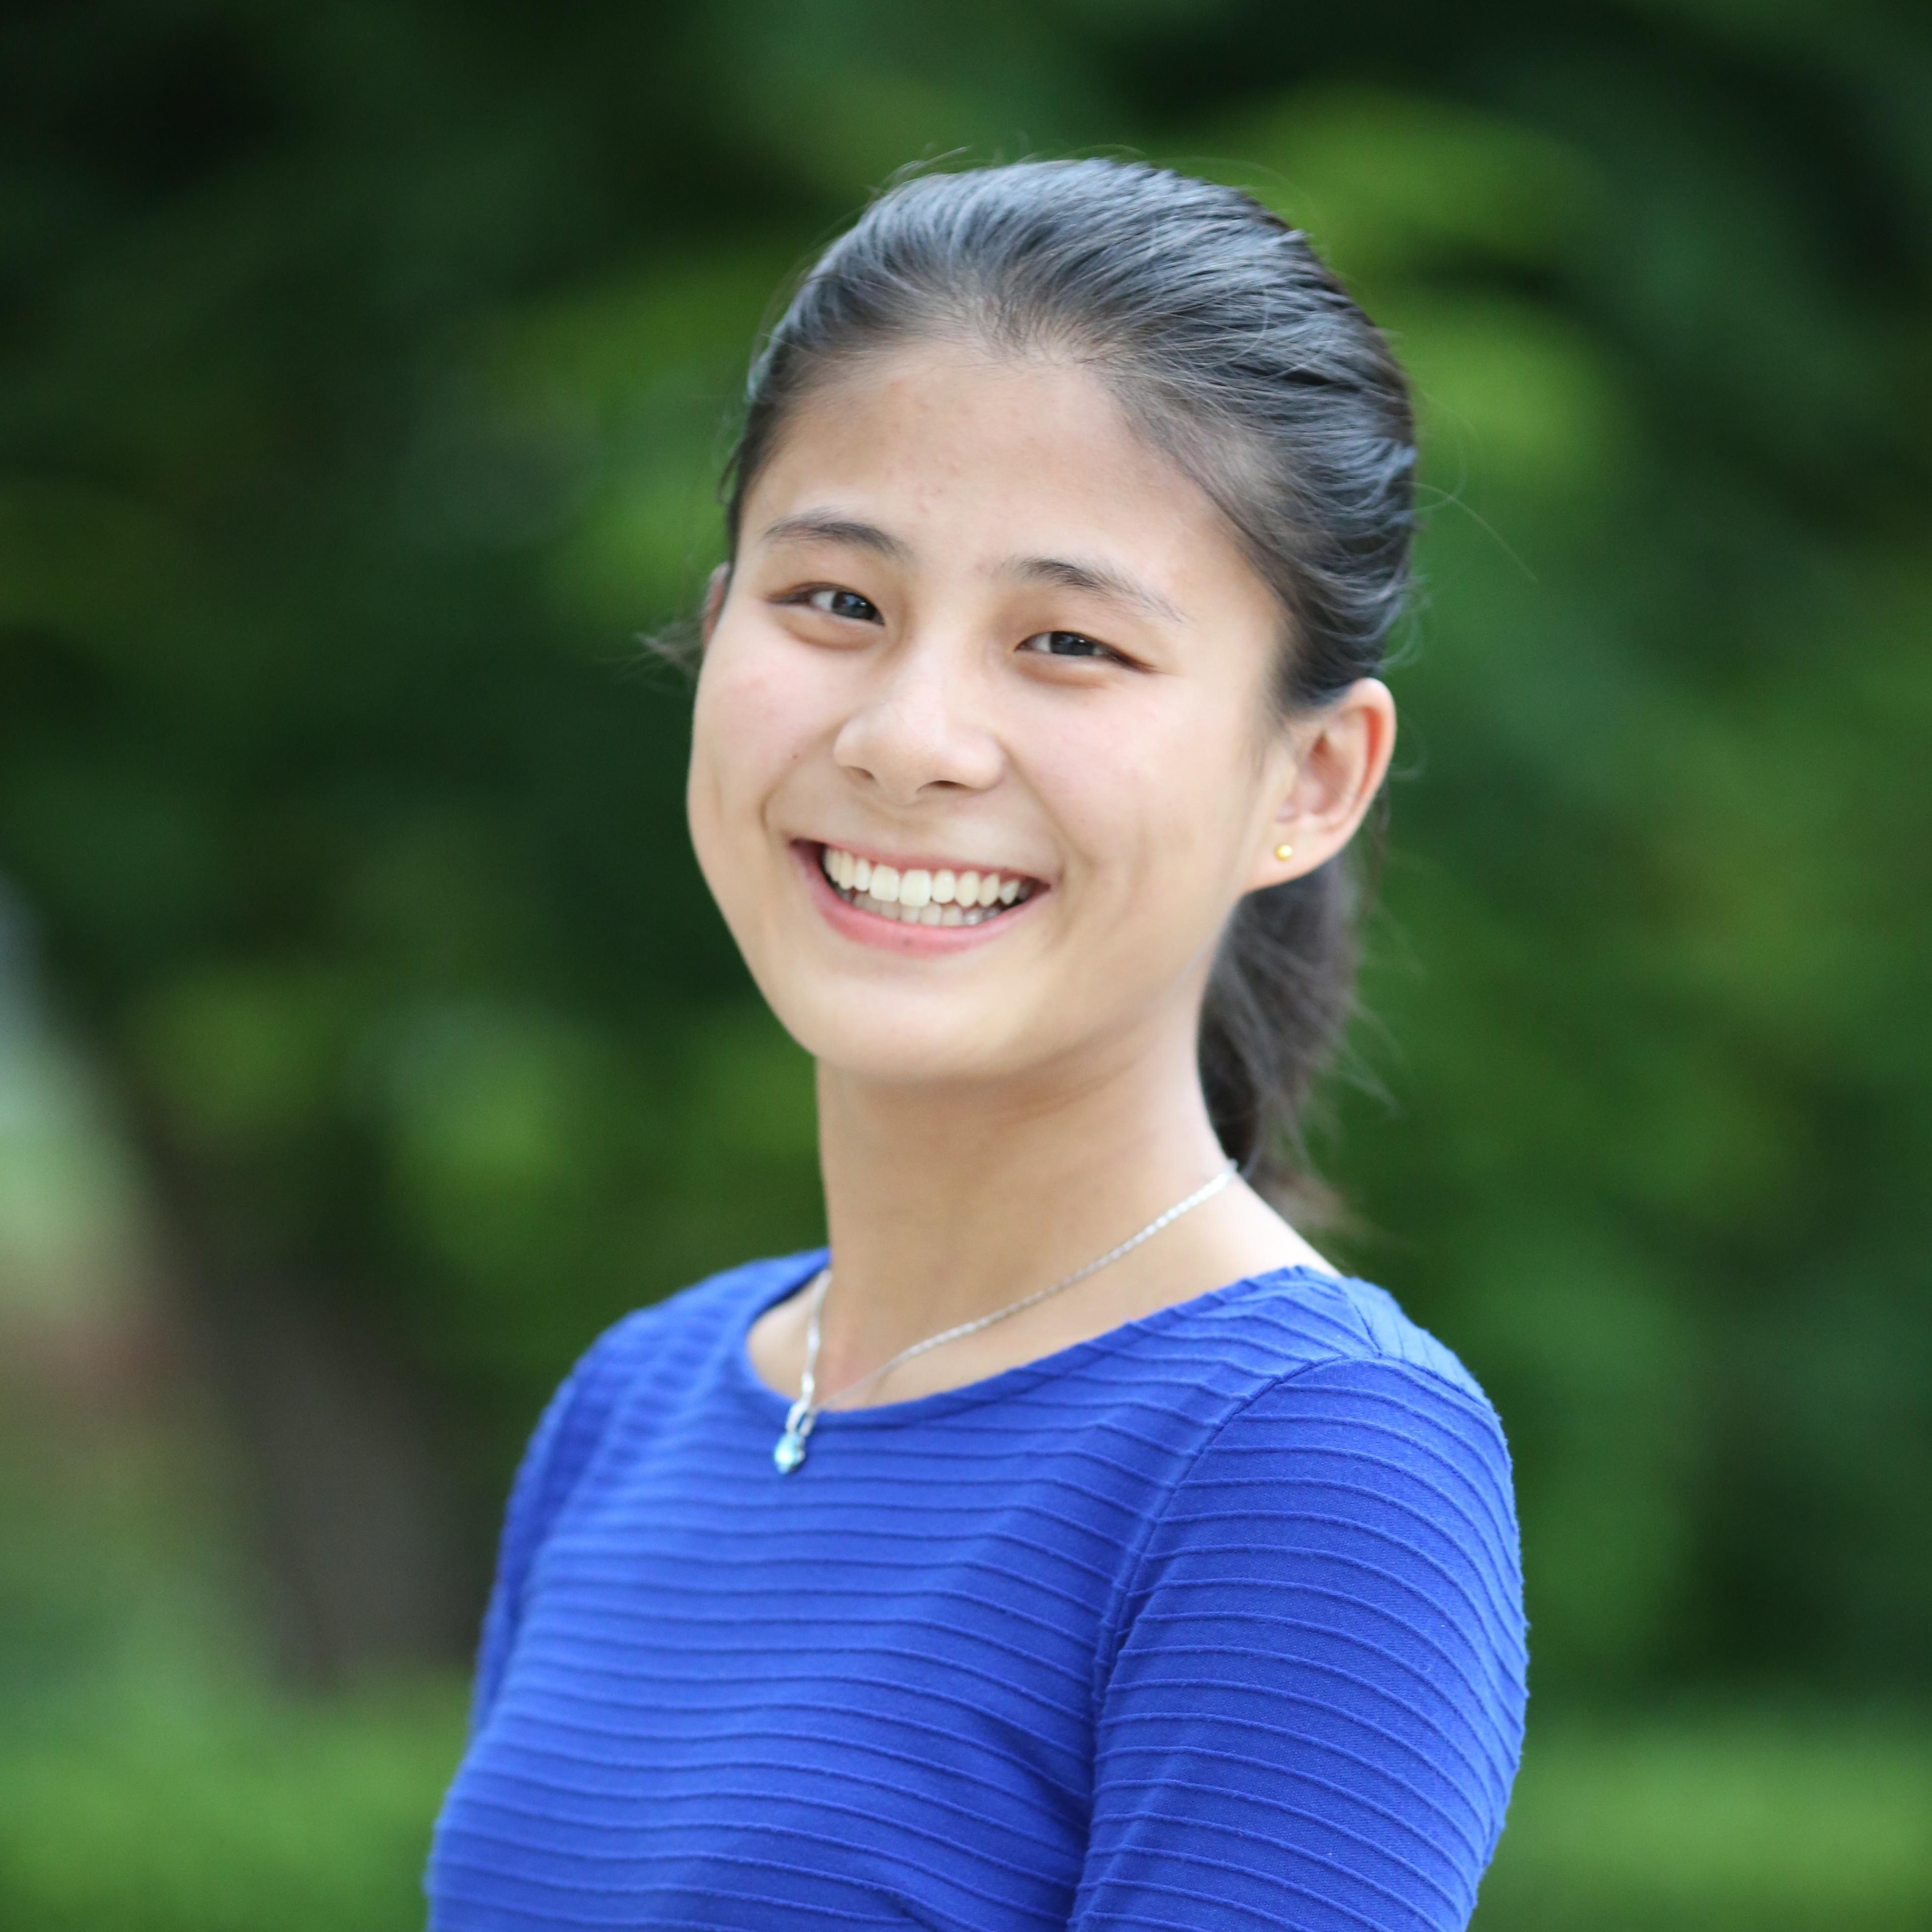 Yichen ZHU - Portrait